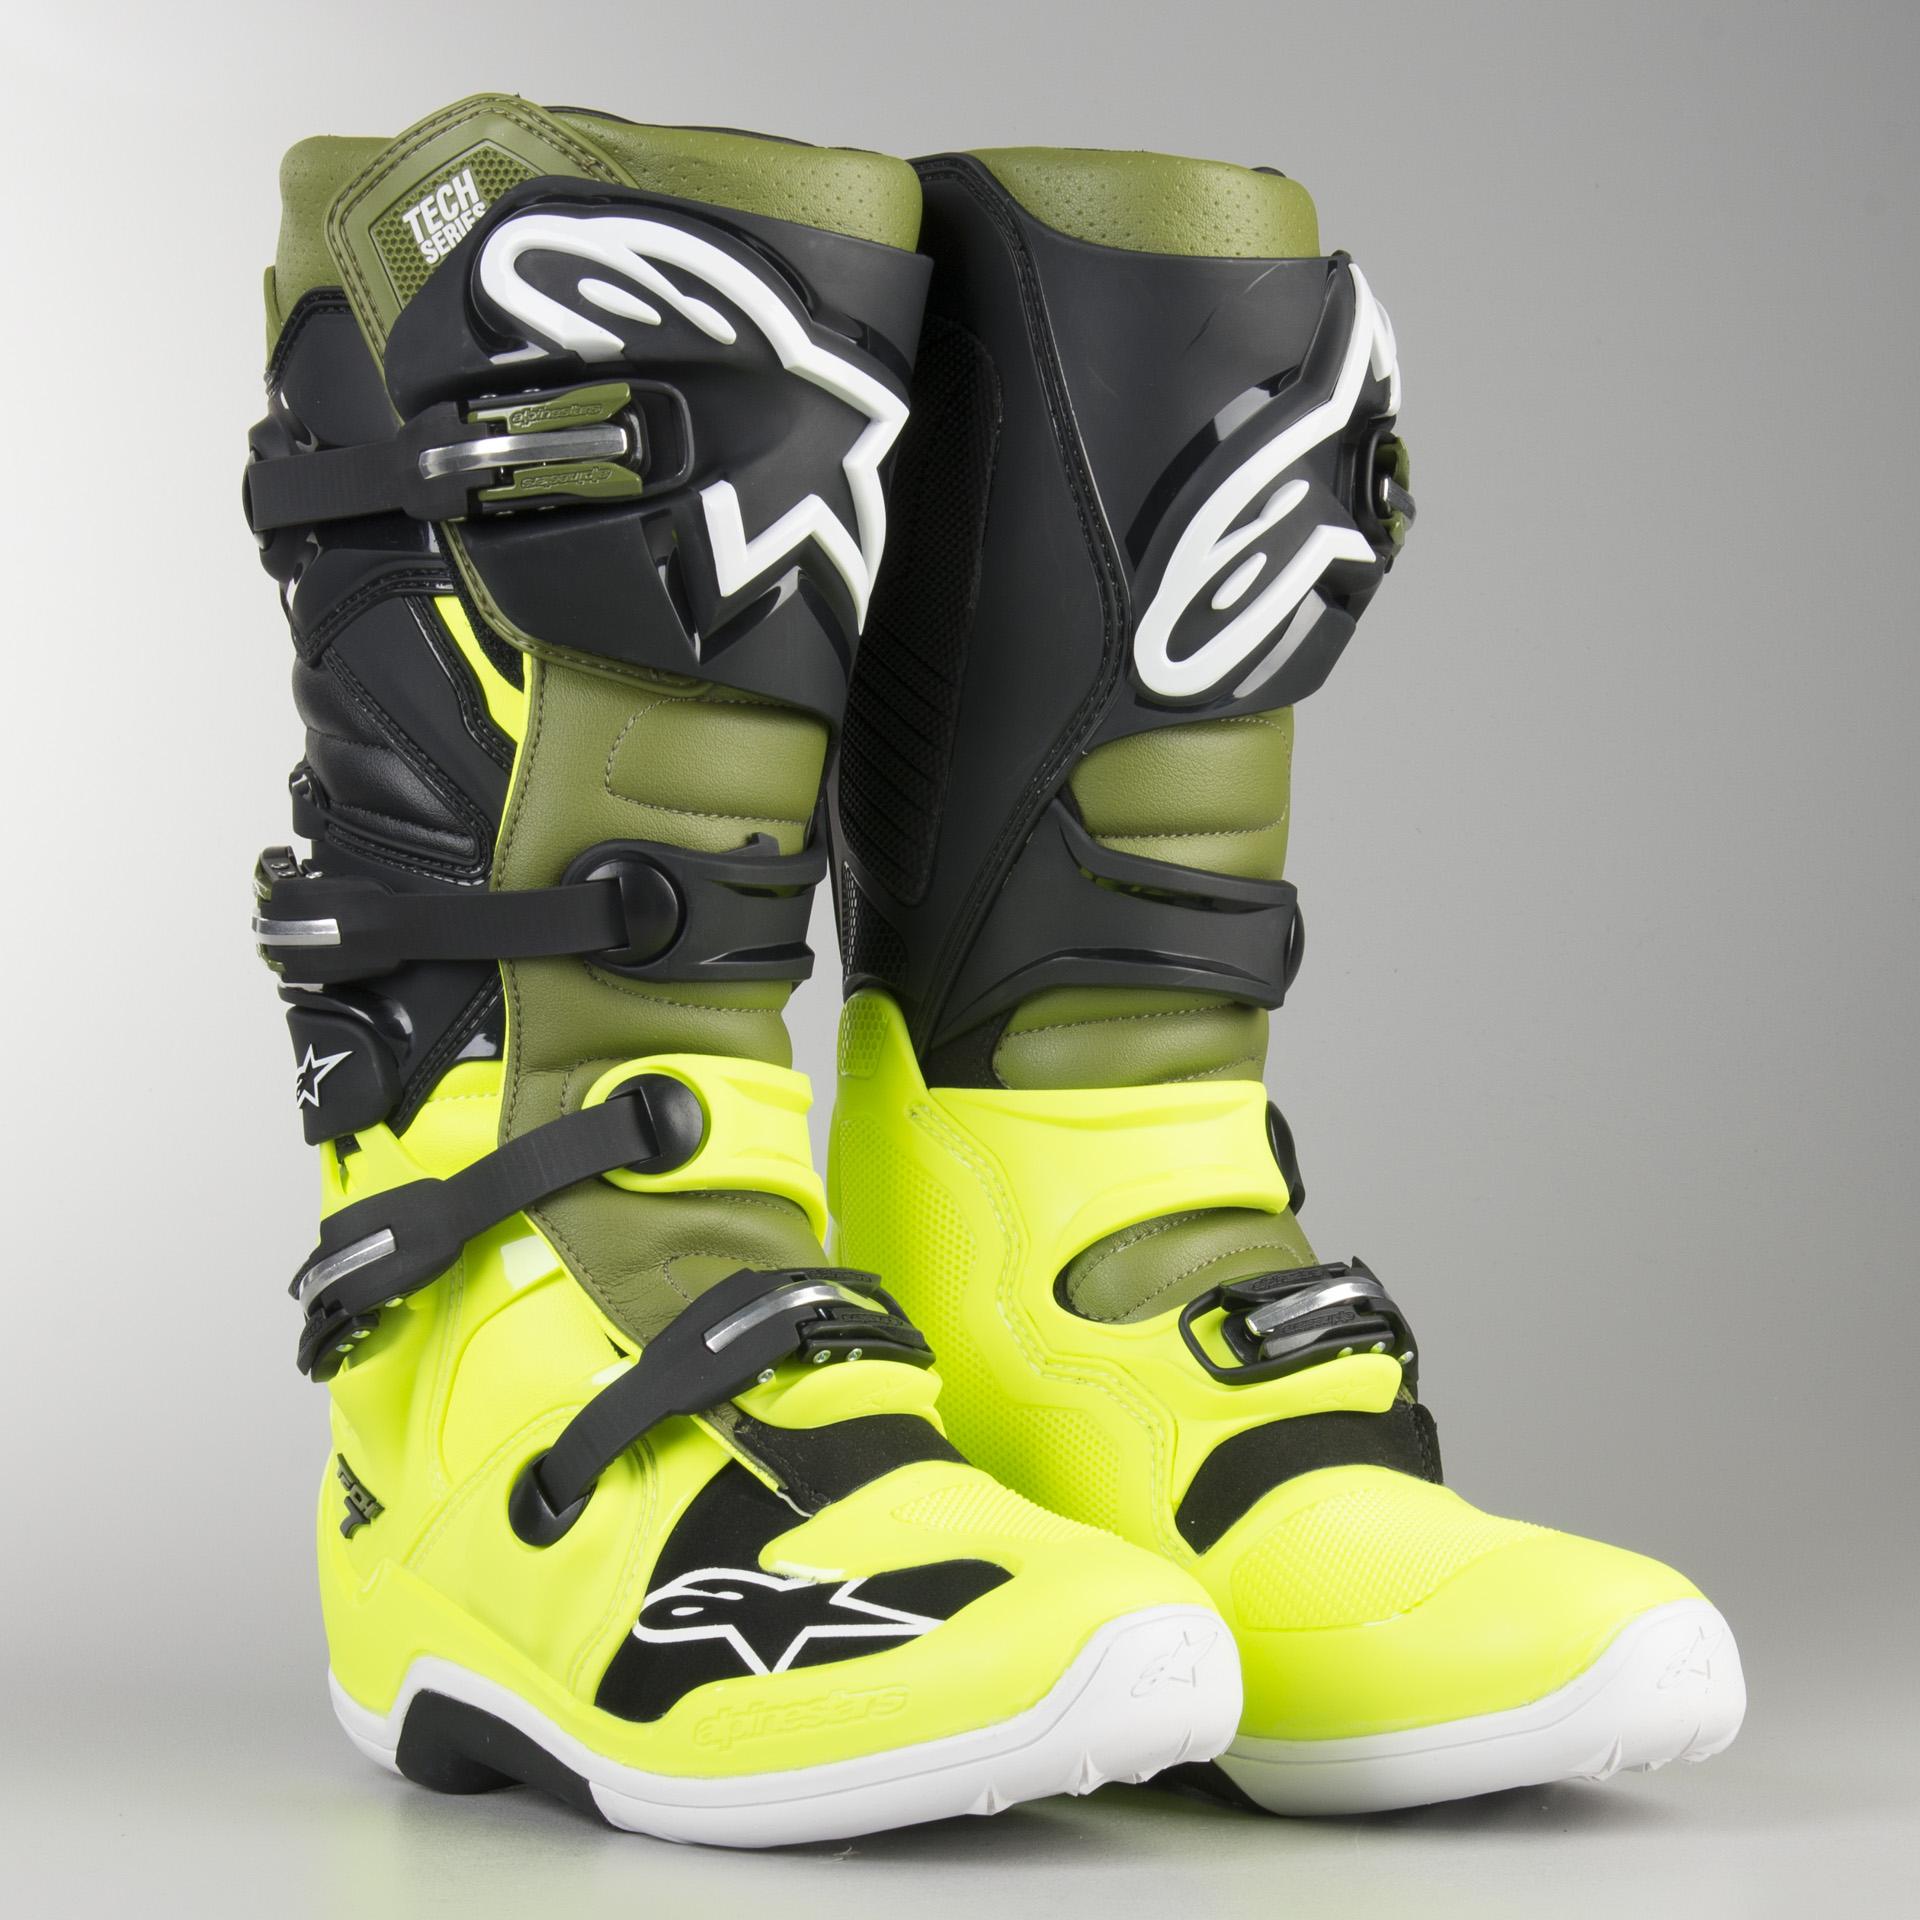 Alpinestars Mens Tech 7 Boots White//Yellow//Blue, Size 8